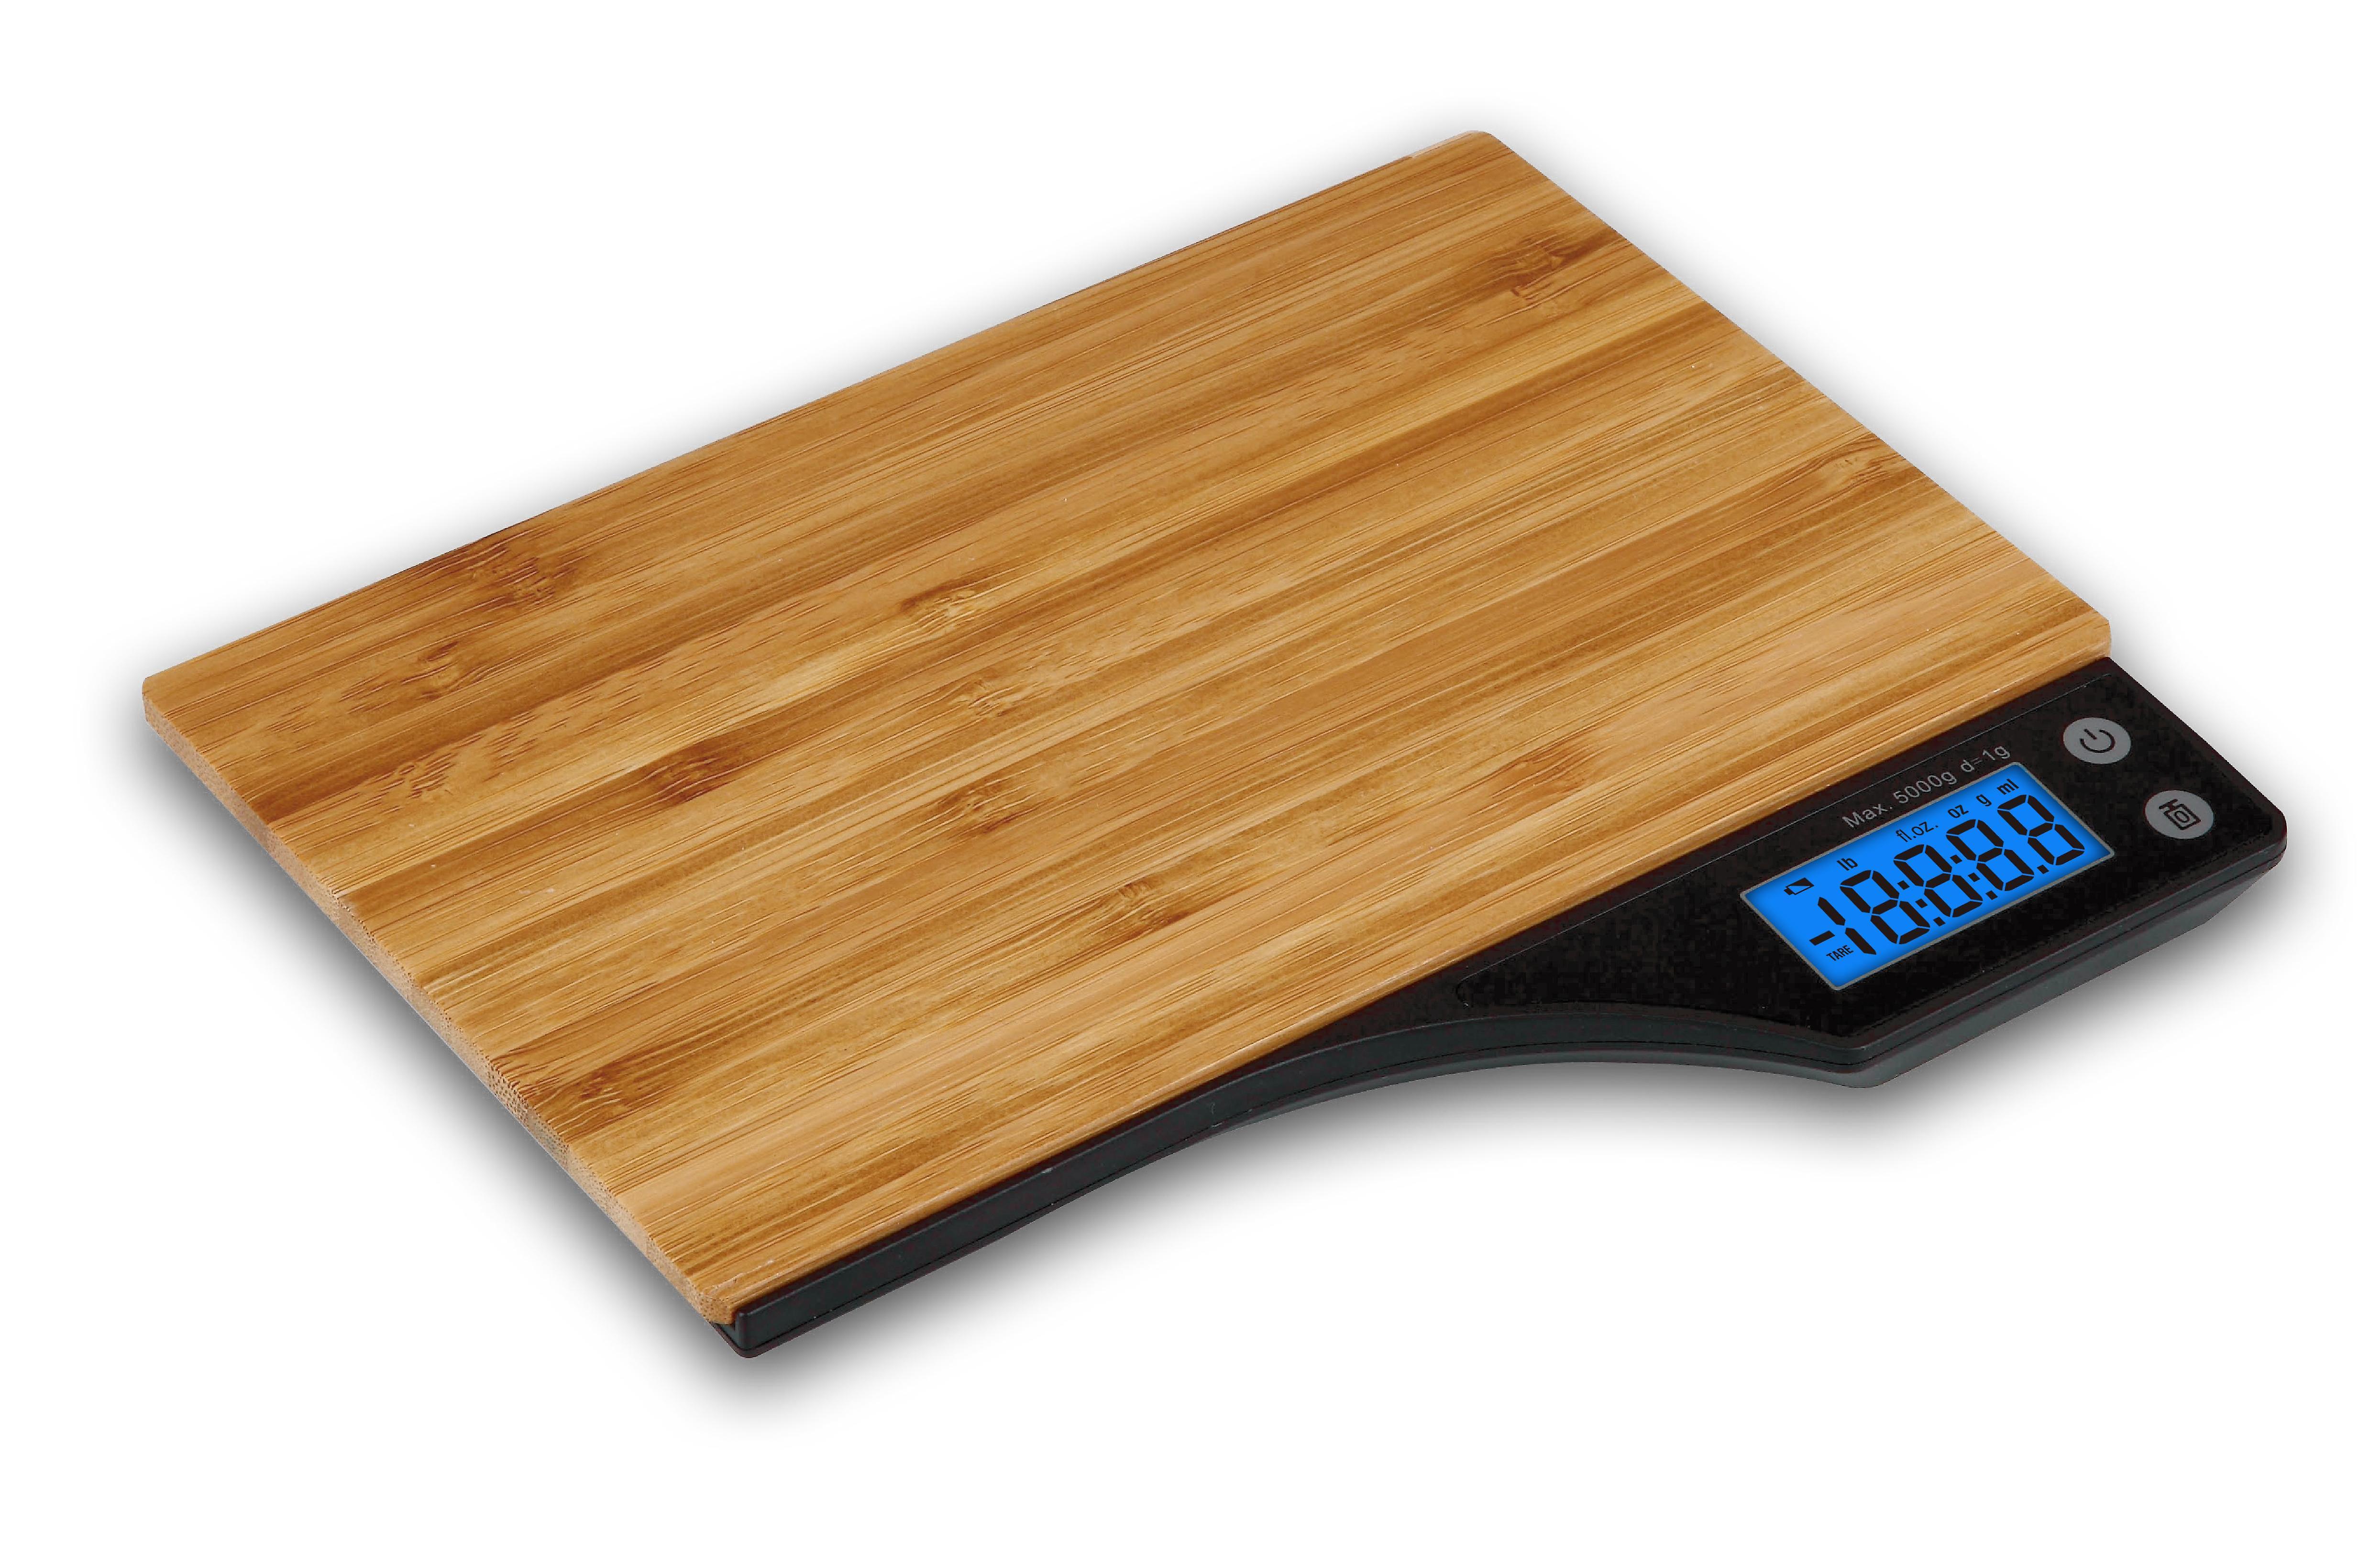 kabalo aus holz bambus haushalt essen kochen wiegen k chenwaage 5kg kapazit t 5000g 1g. Black Bedroom Furniture Sets. Home Design Ideas